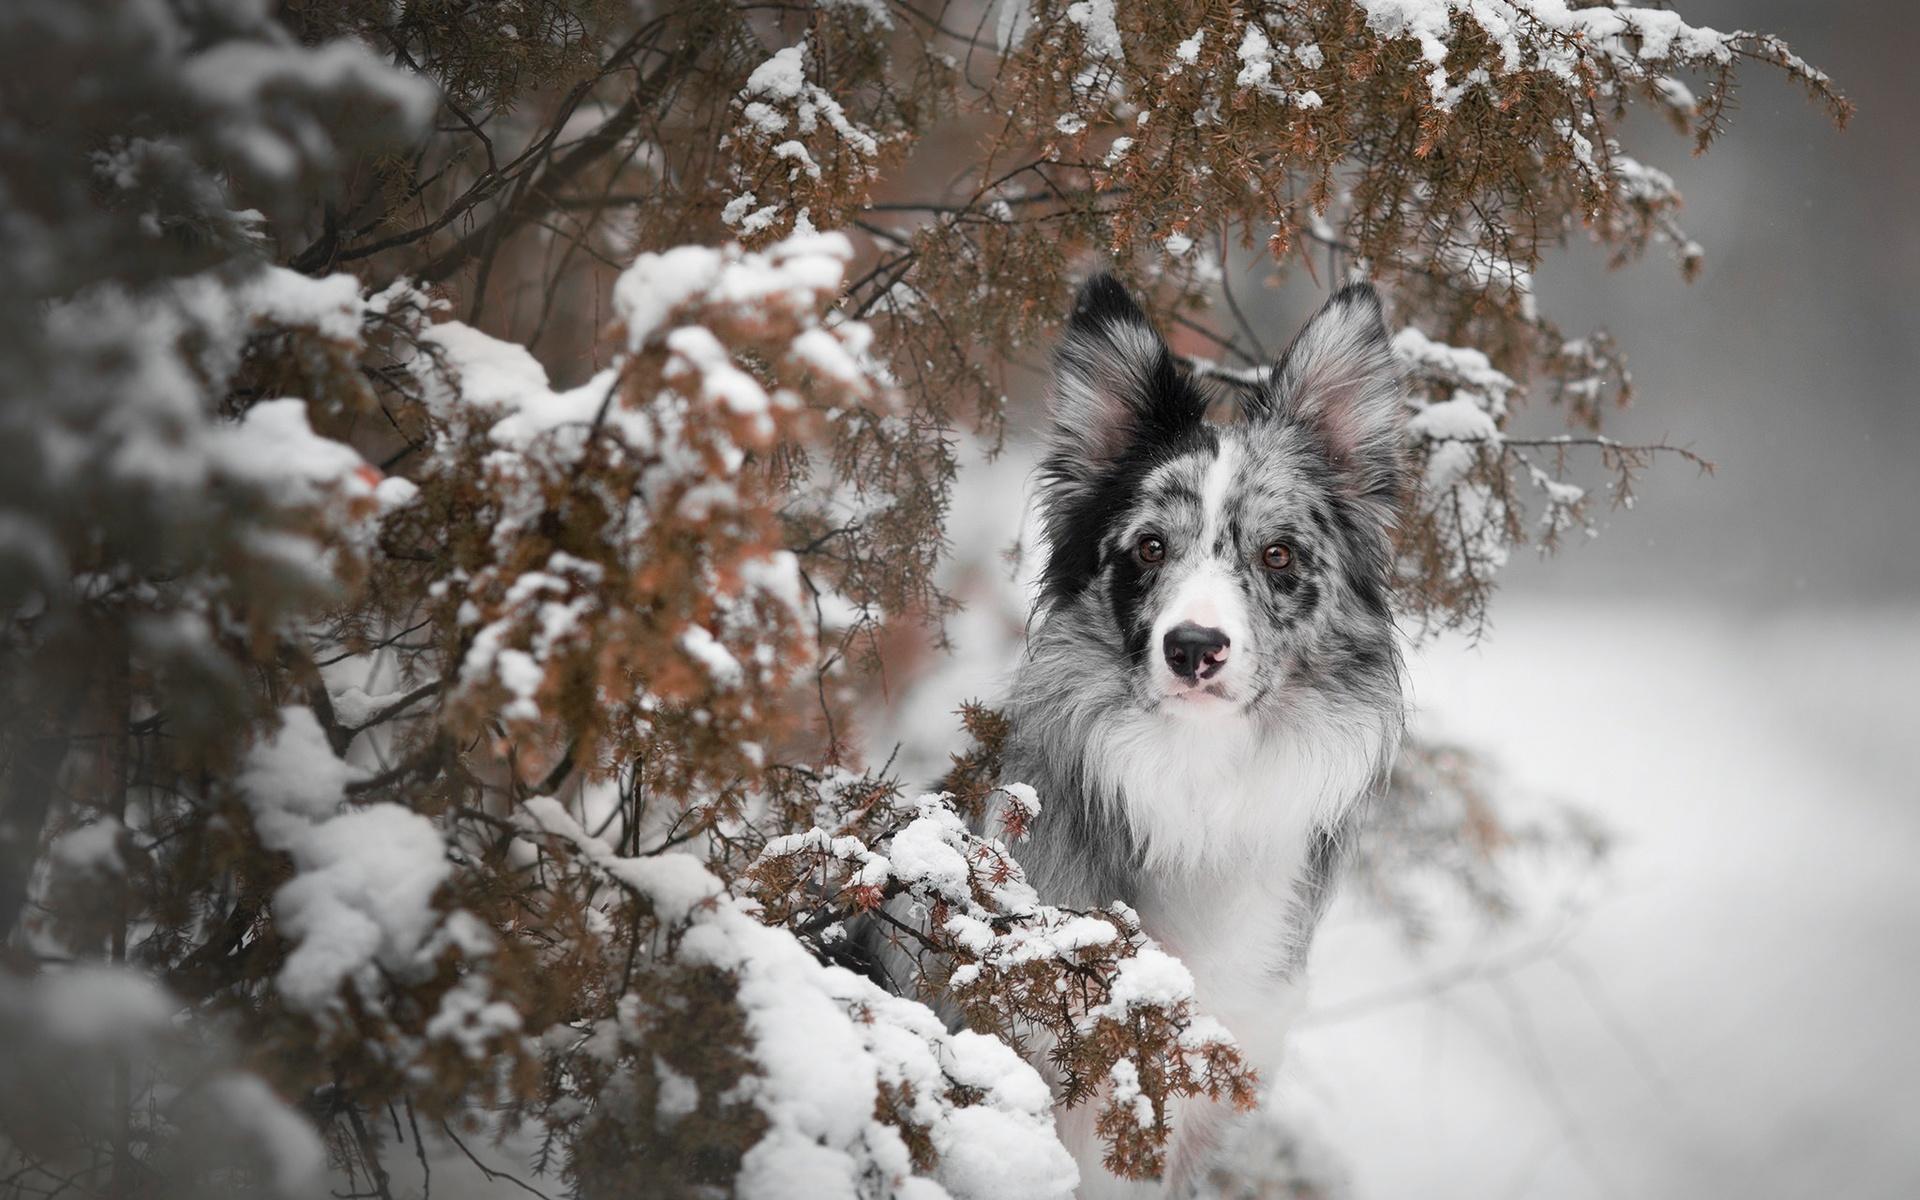 животное, собака, пёс, бордер-колли, морда, природа, зима, снег, ветки